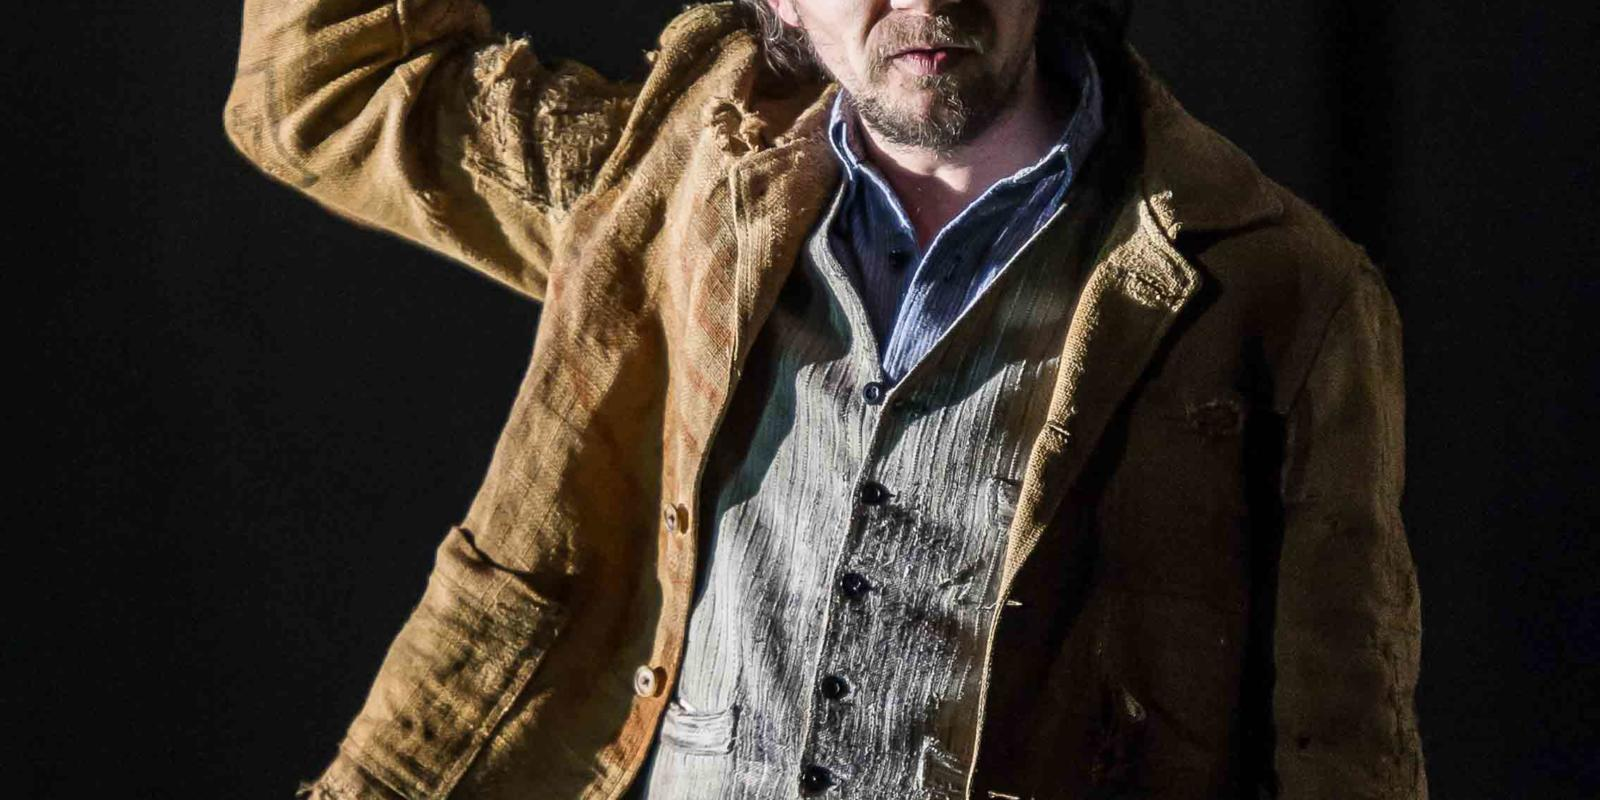 An image of Iestyn Davies in Richard Jones's 2014 production of Rodelinda